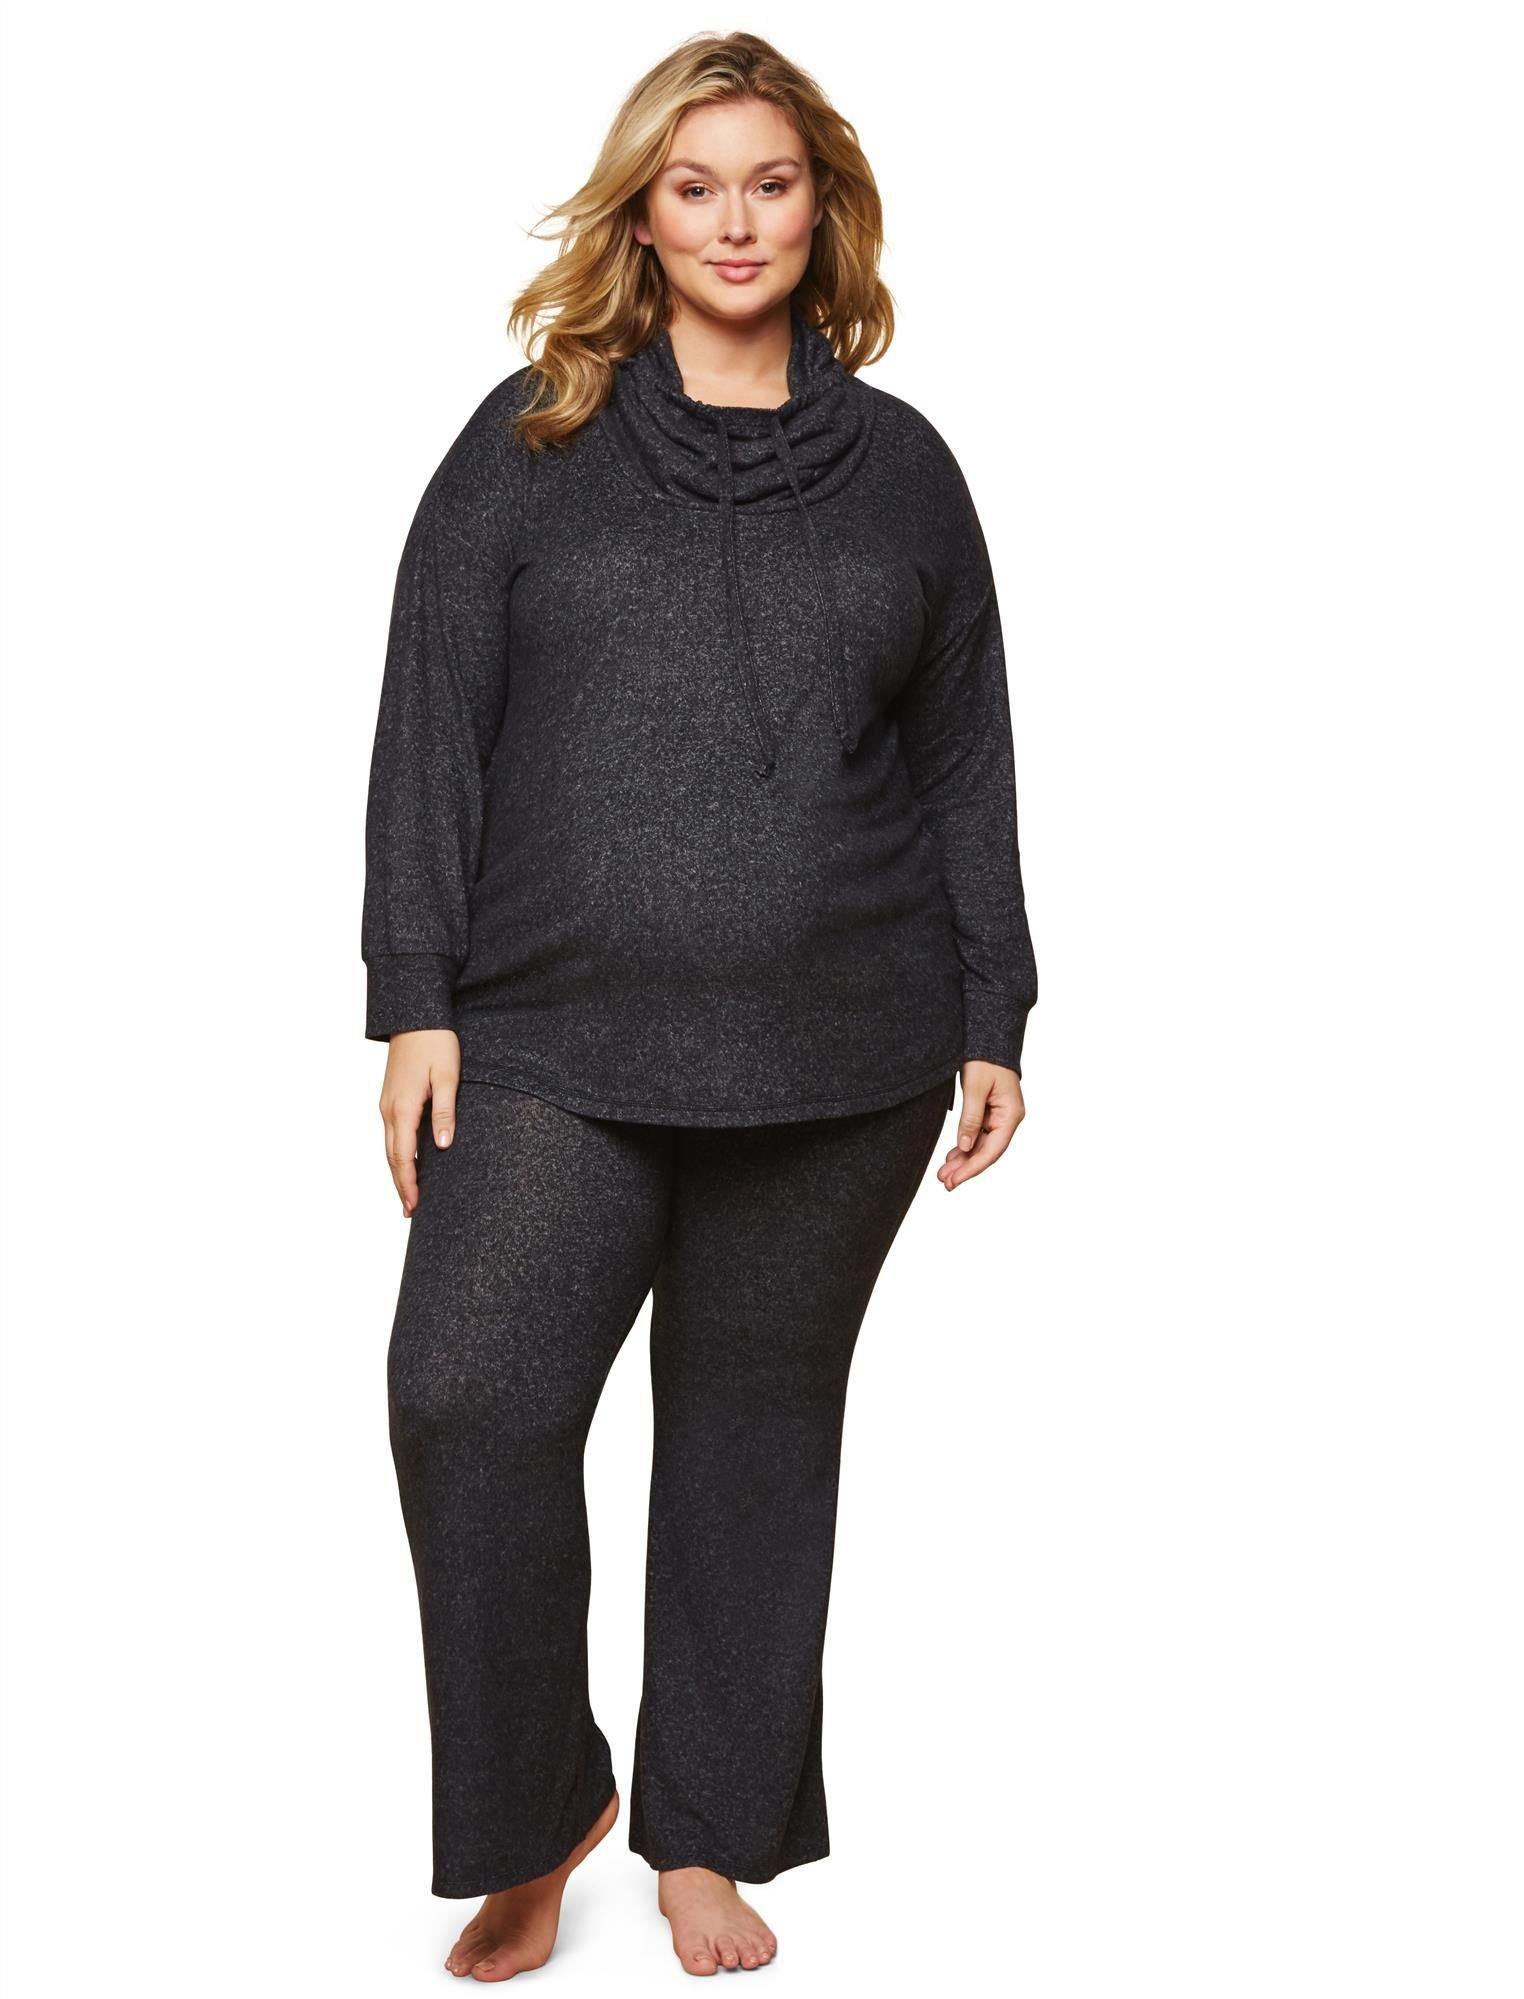 Motherhood Maternity Women's Maternity Plus-Size Knit Secret Fit Belly Wide Leg Lounge Pant, Black and Grey Marl, 1X